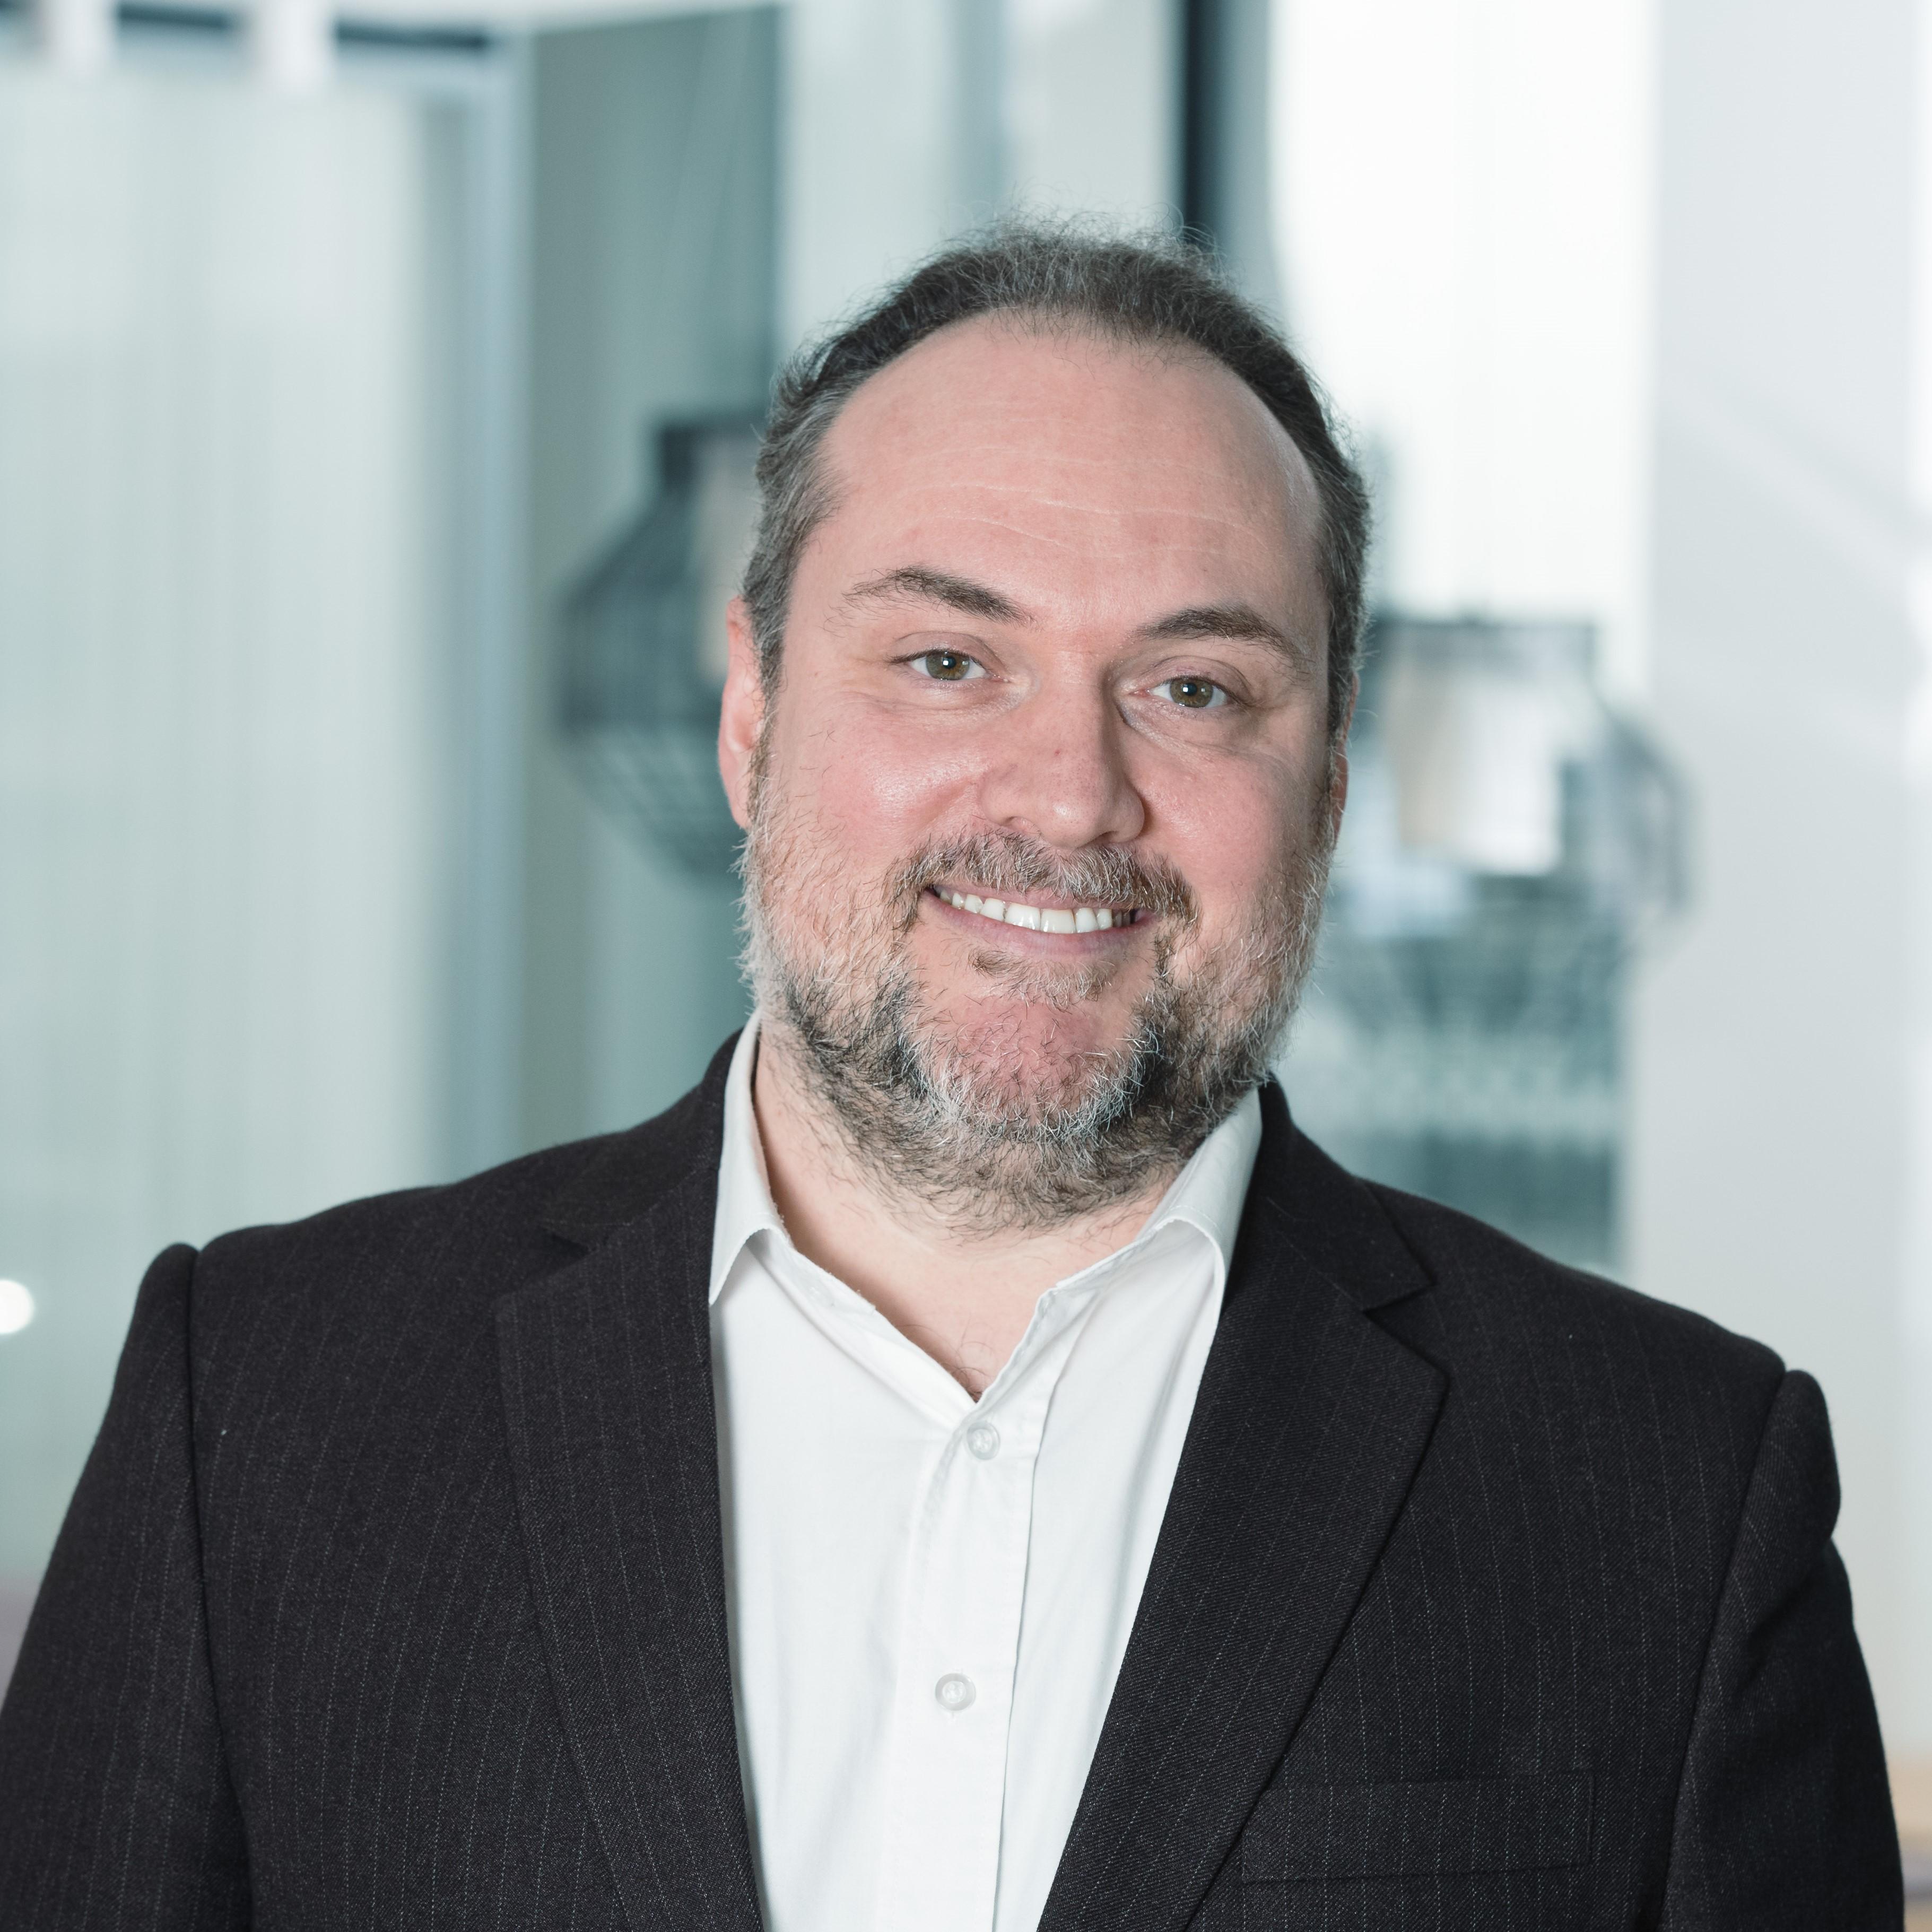 Sébastien Foucaud